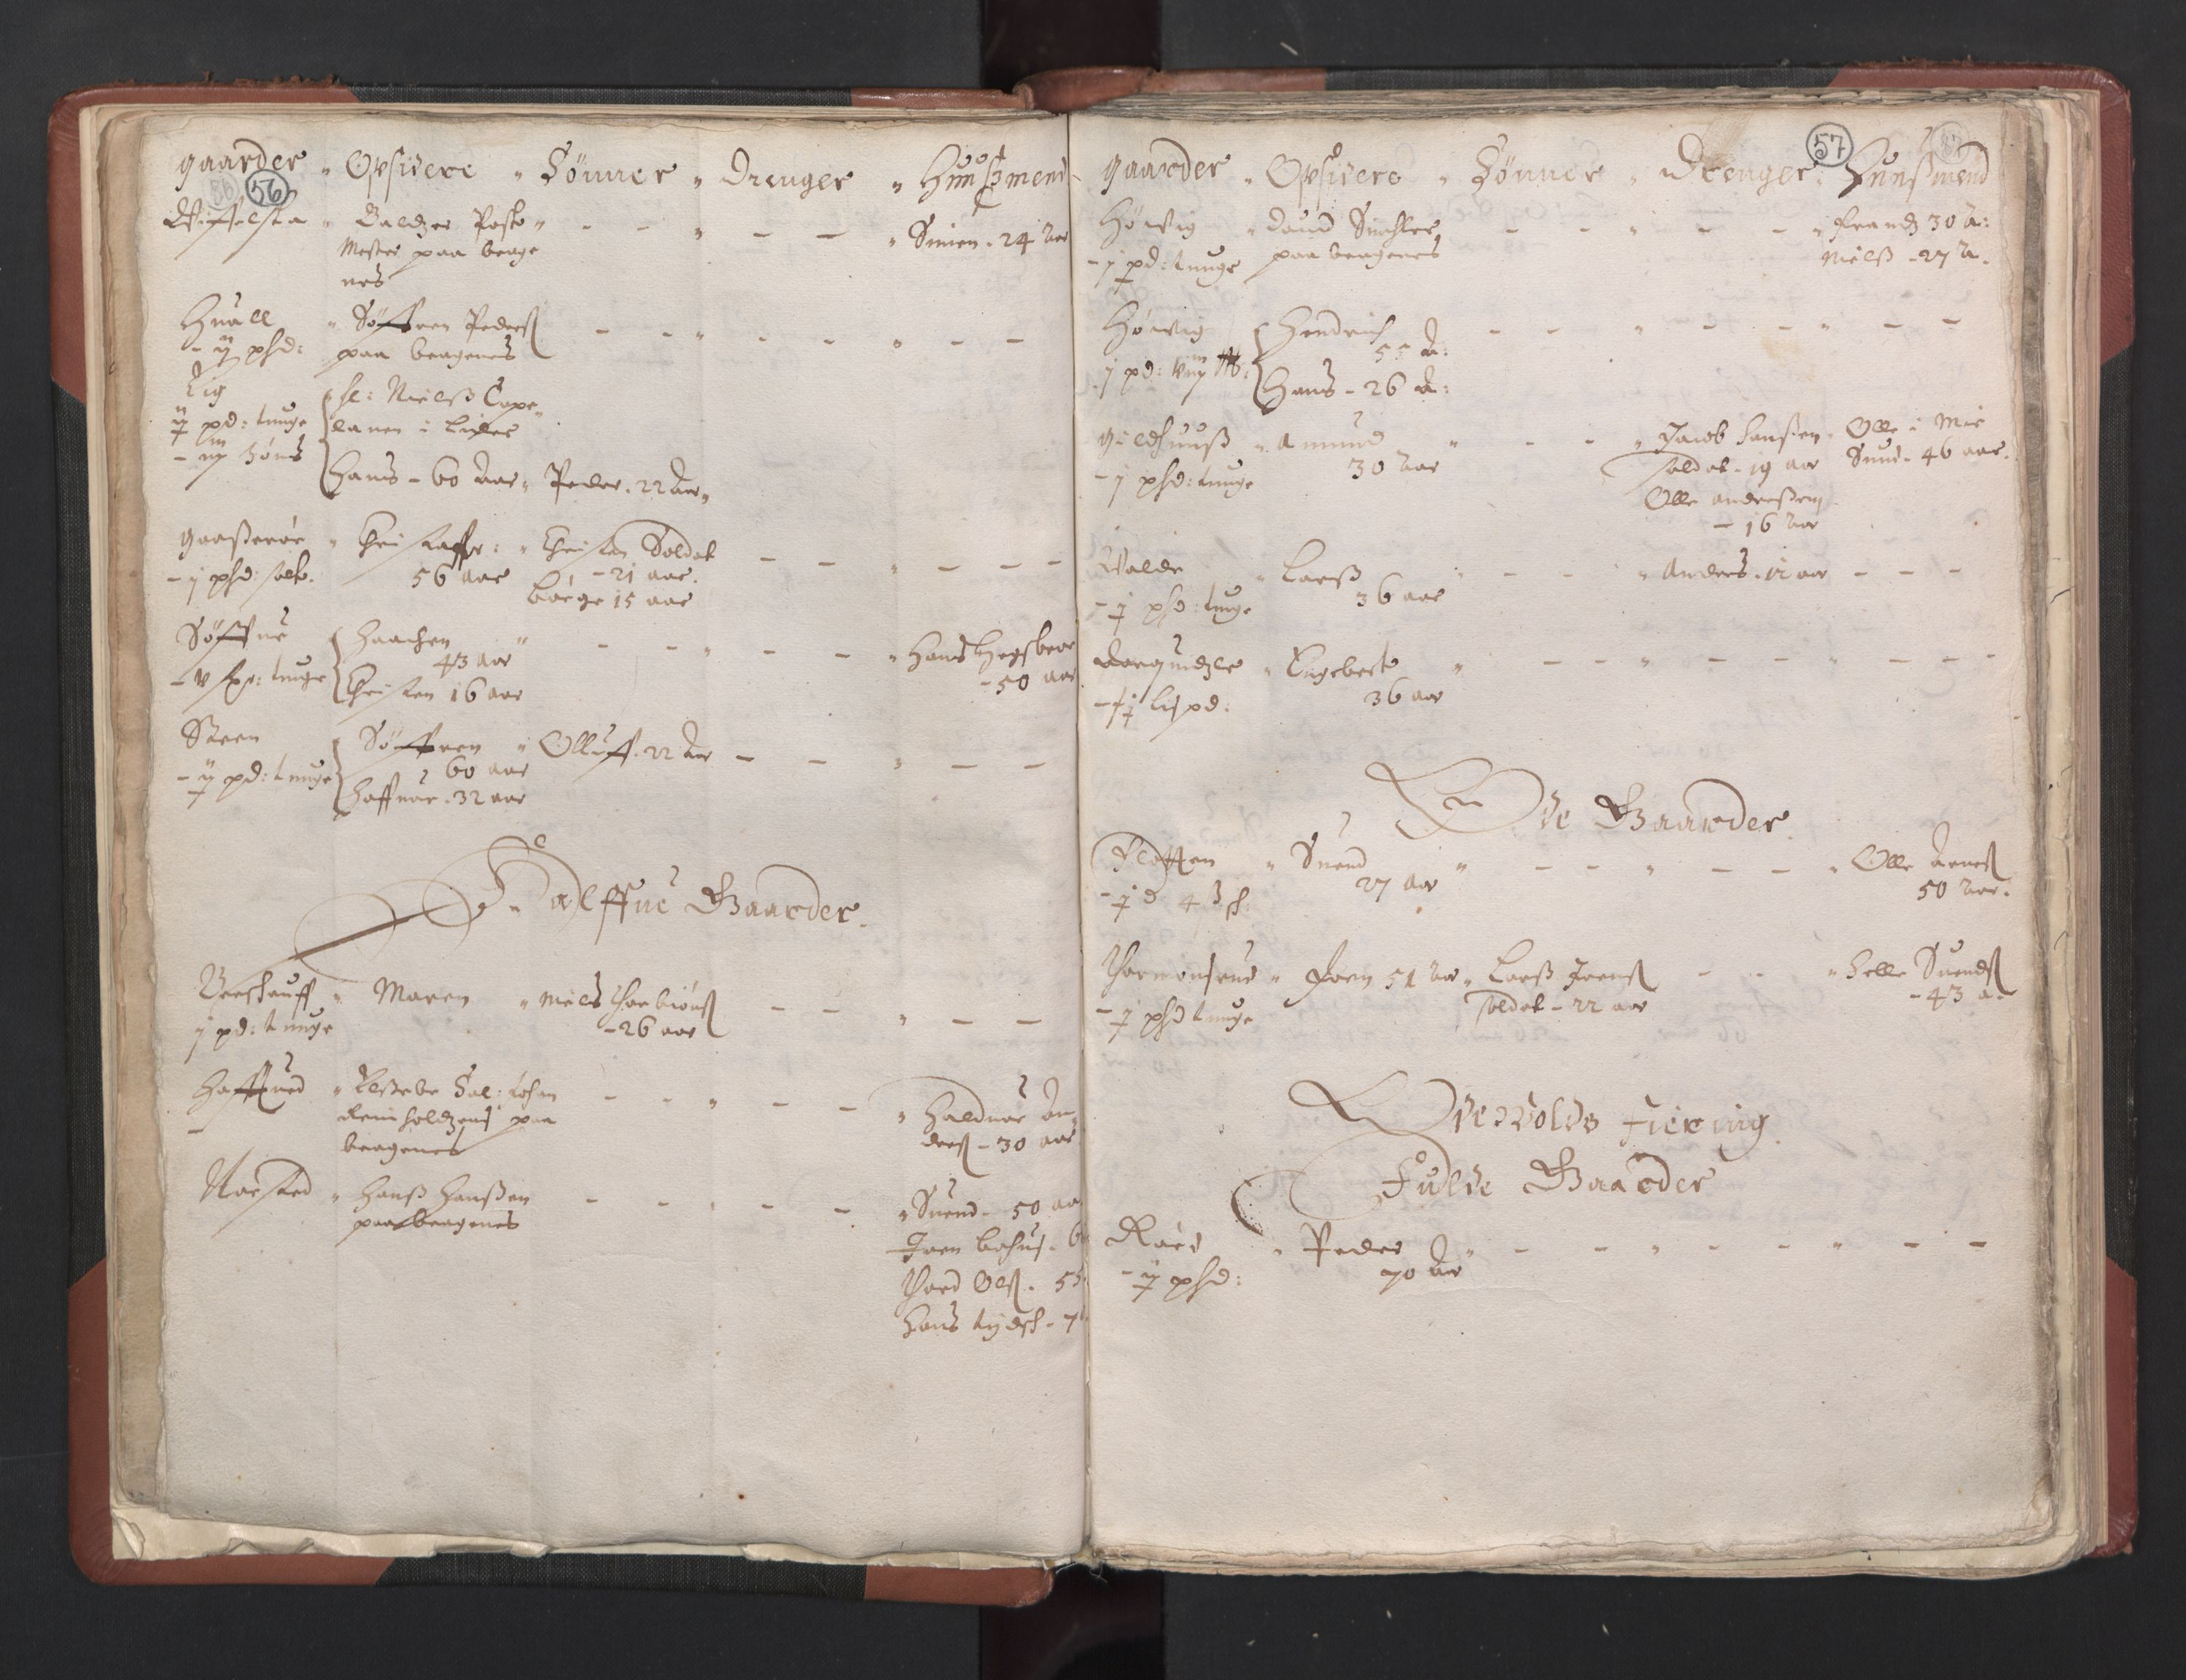 RA, Fogdenes og sorenskrivernes manntall 1664-1666, nr. 5: Fogderier (len og skipreider) i nåværende Buskerud fylke og Vestfold fylke, 1664, s. 56-57